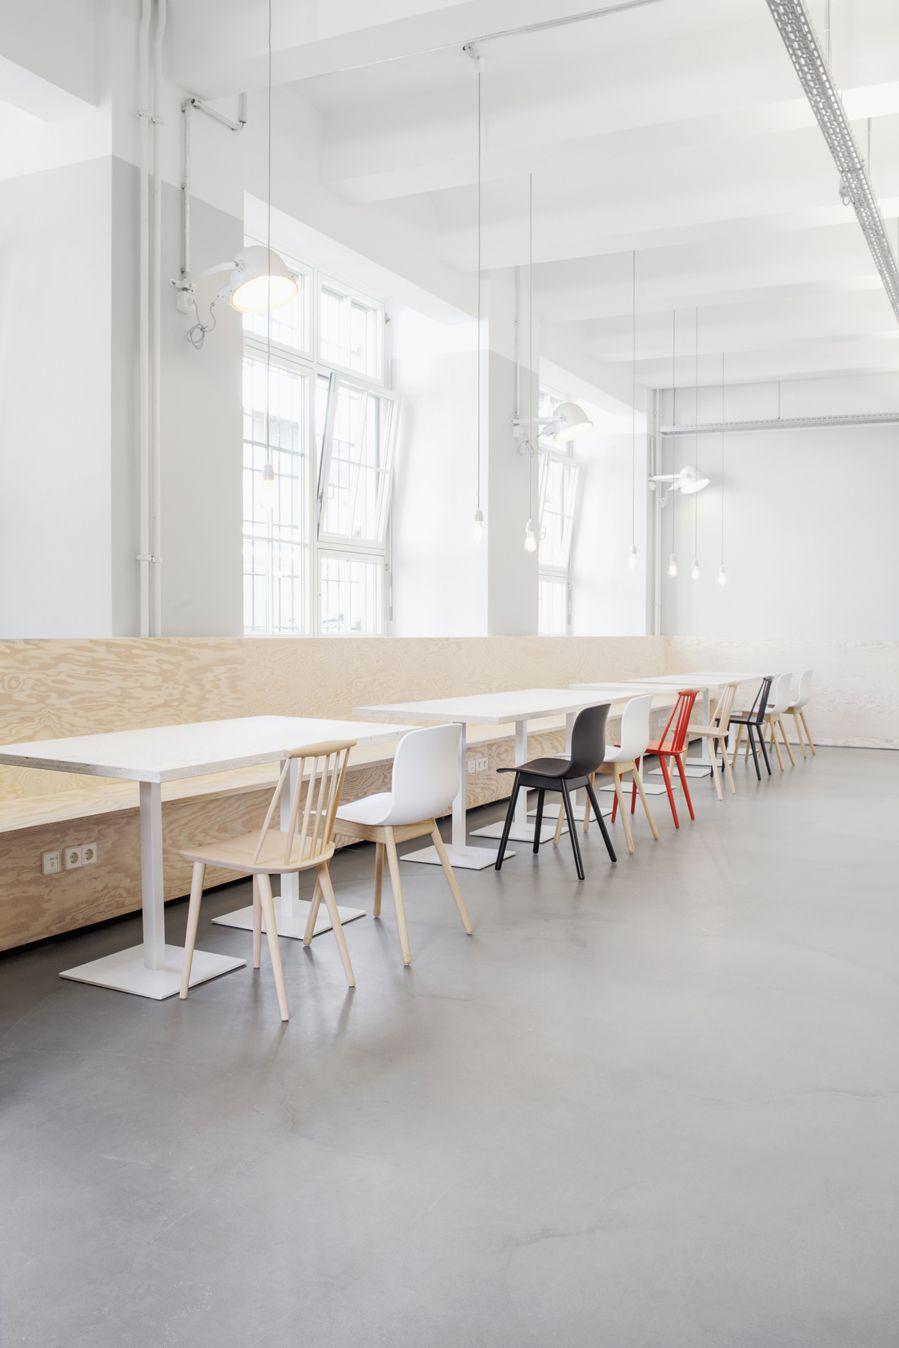 zalando - berlin - industrial - industriel - canteen - kantine ...